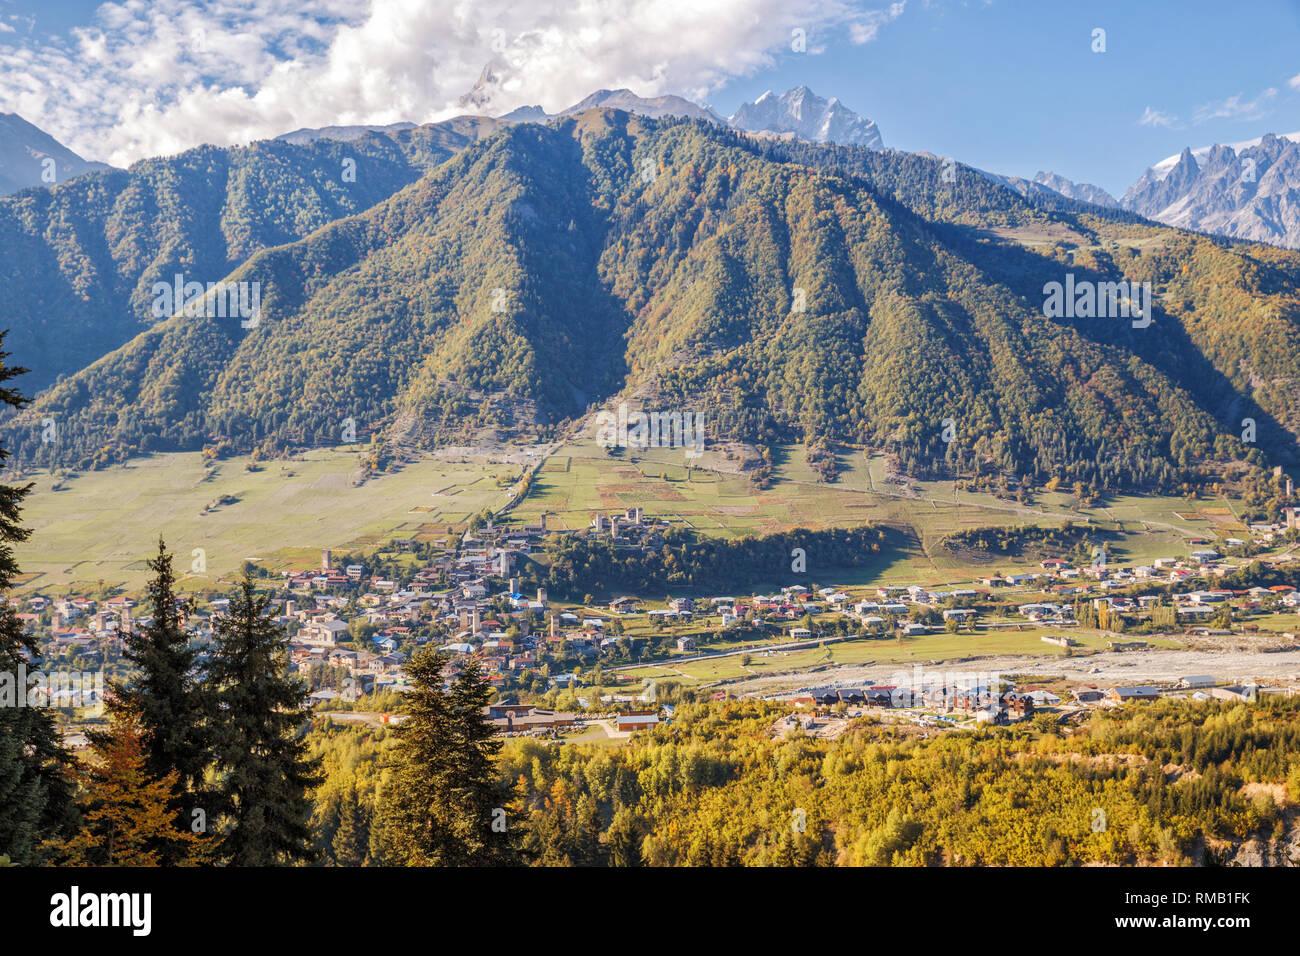 Caucasian landscape, aerial view of the town Mestia in mountain valley, Upper Svaneti, Georgia Stock Photo